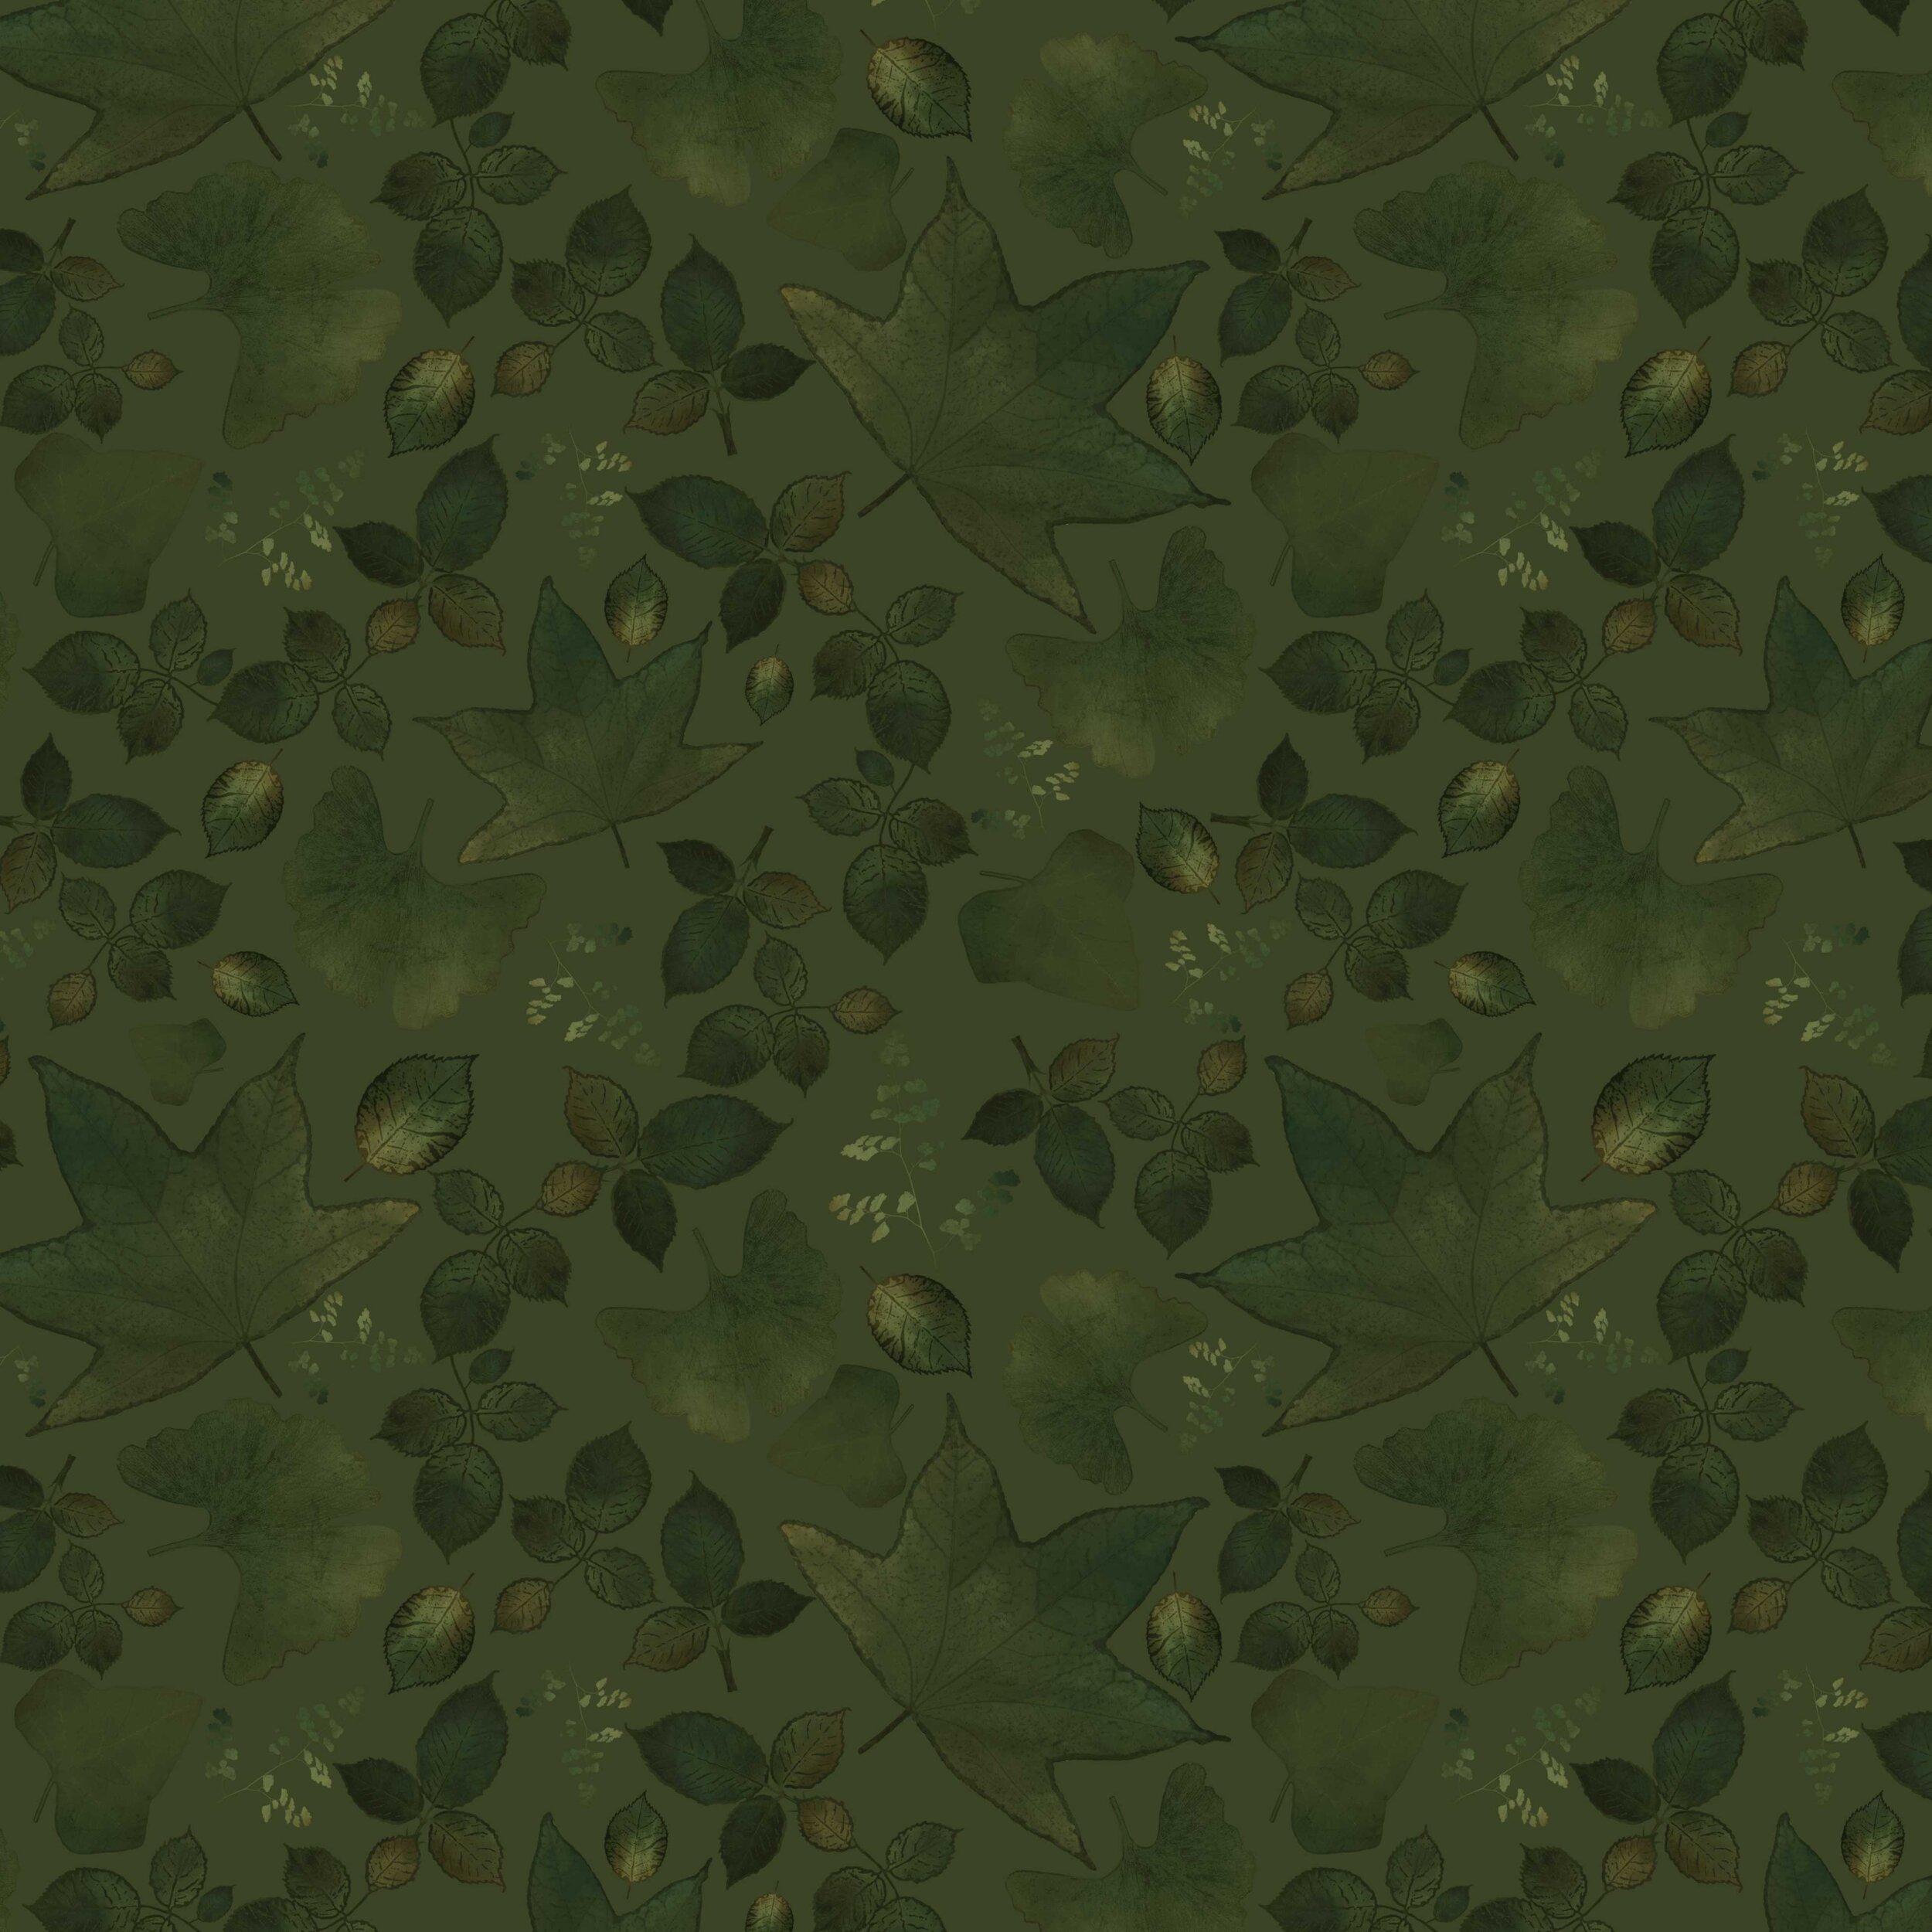 eco repeat fabric autumn green background.jpg